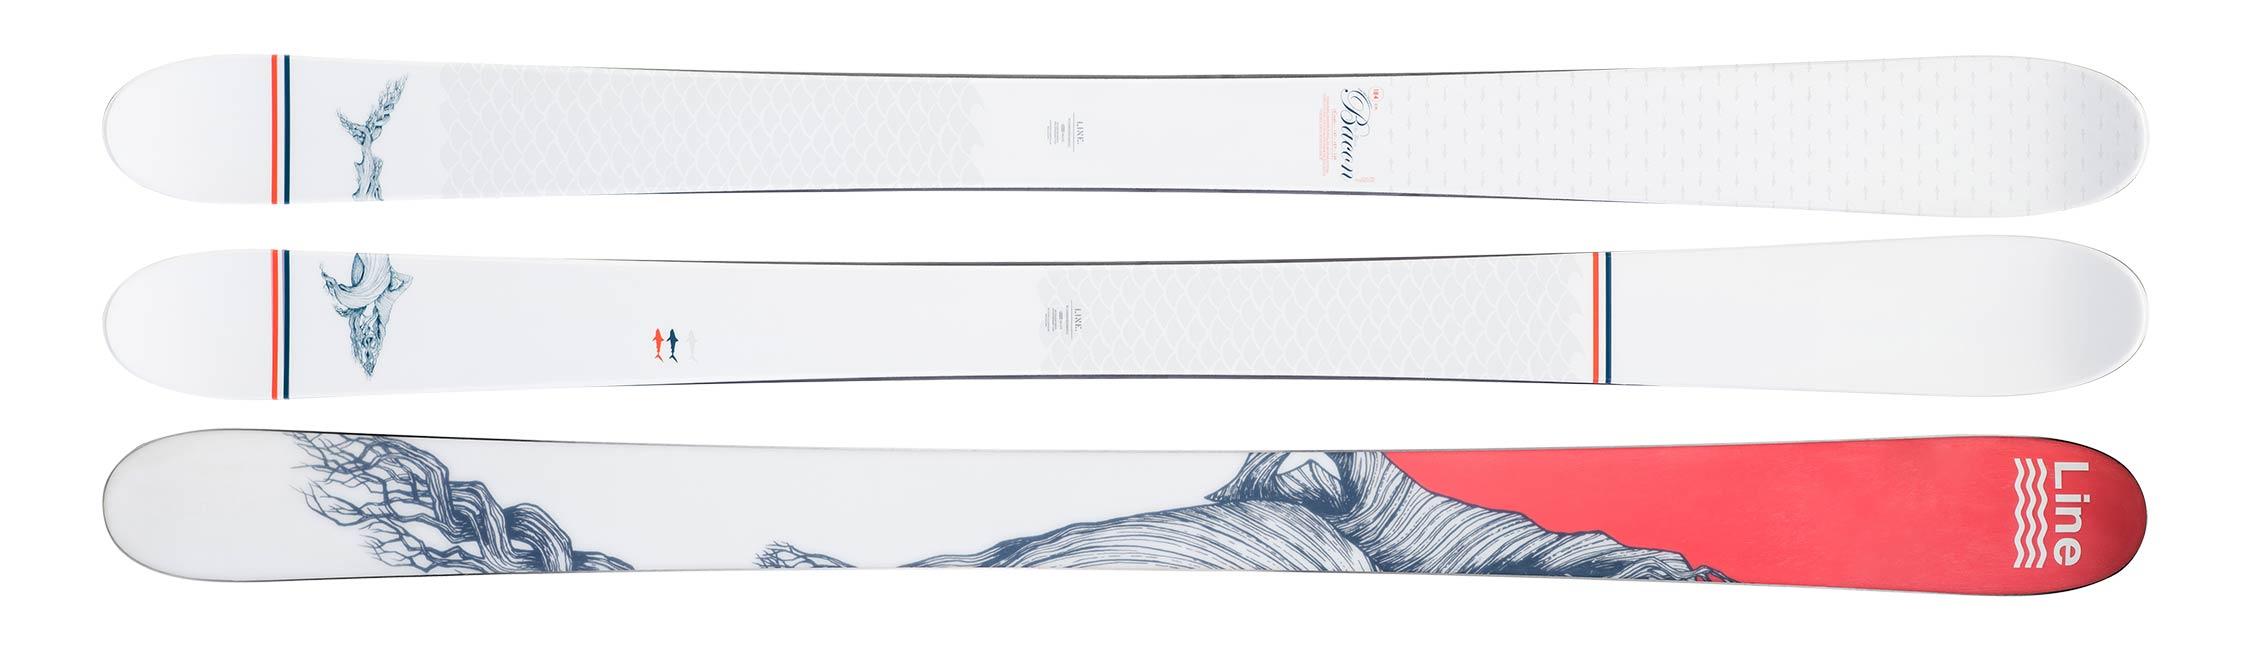 Line Skis Sir Francis Bacon: Topsheet & Base